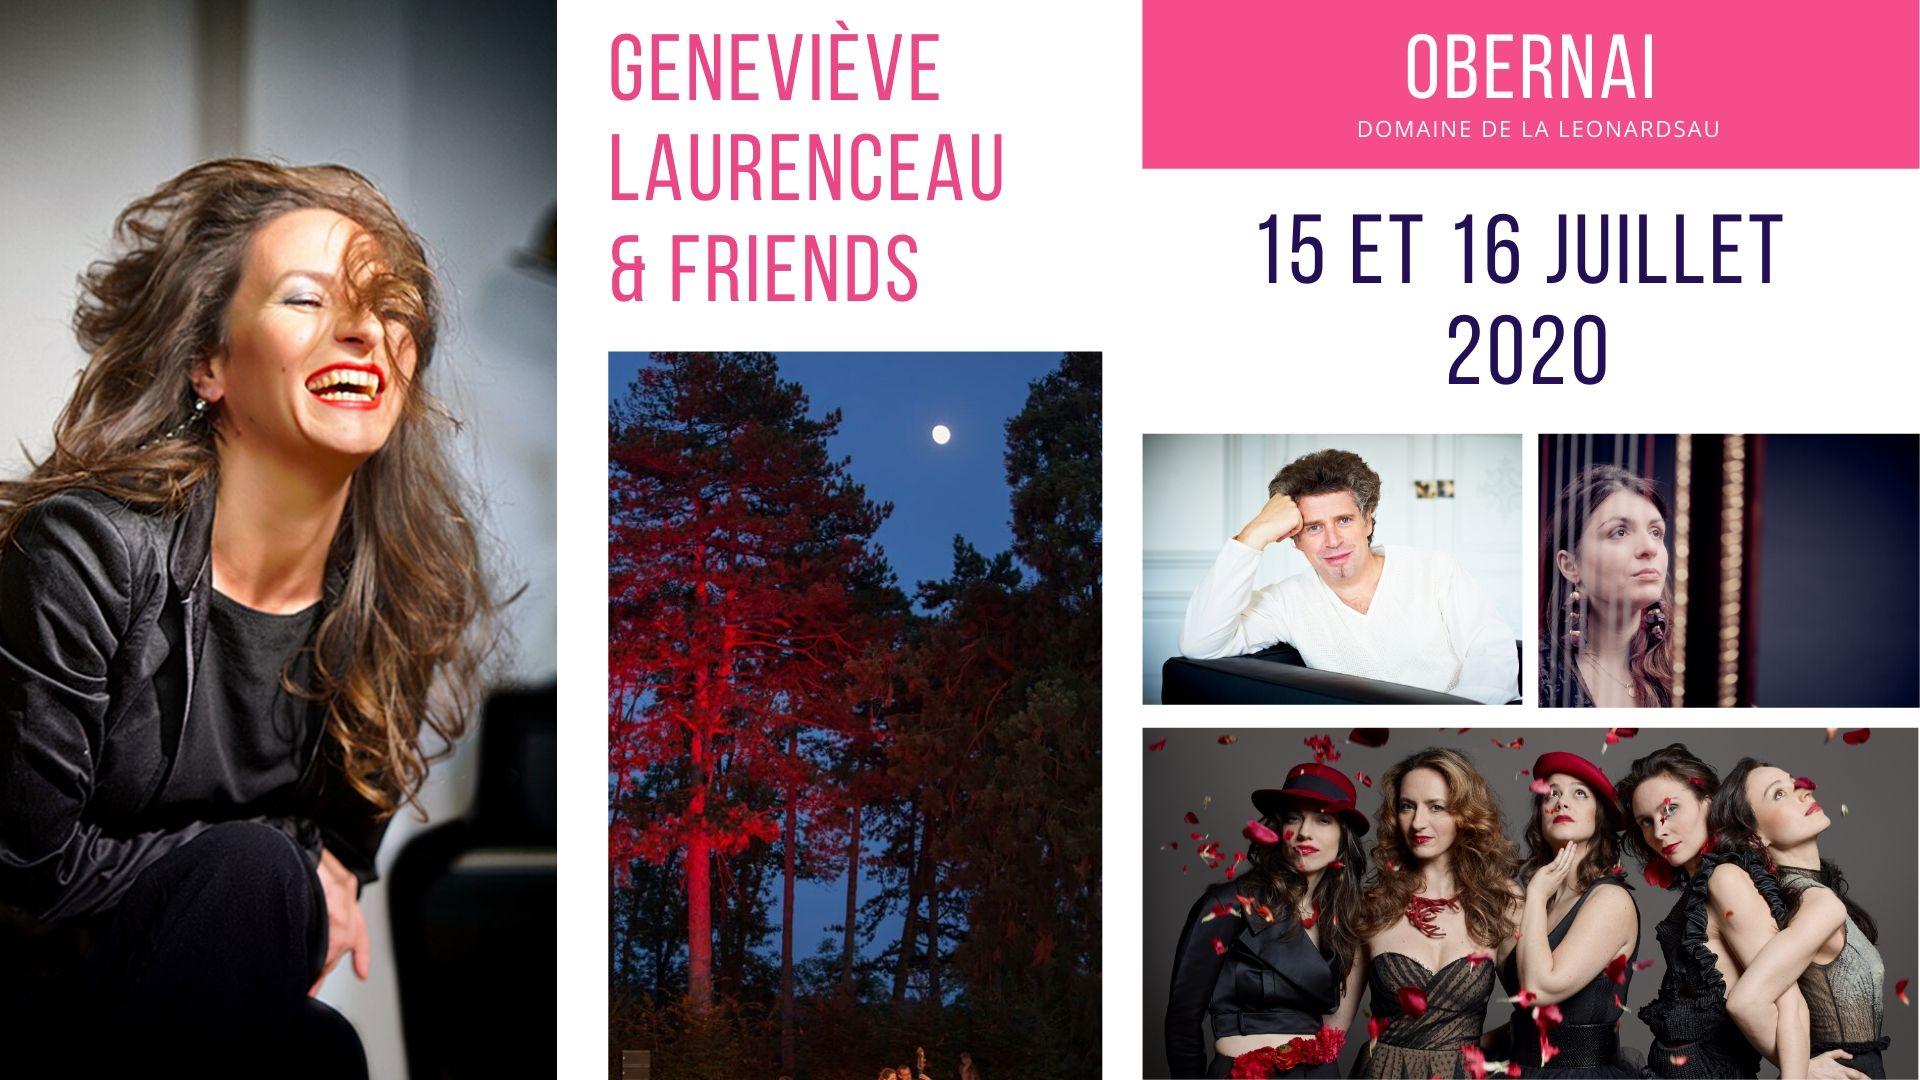 Geneviève Laurenceau & Friends à Obernai